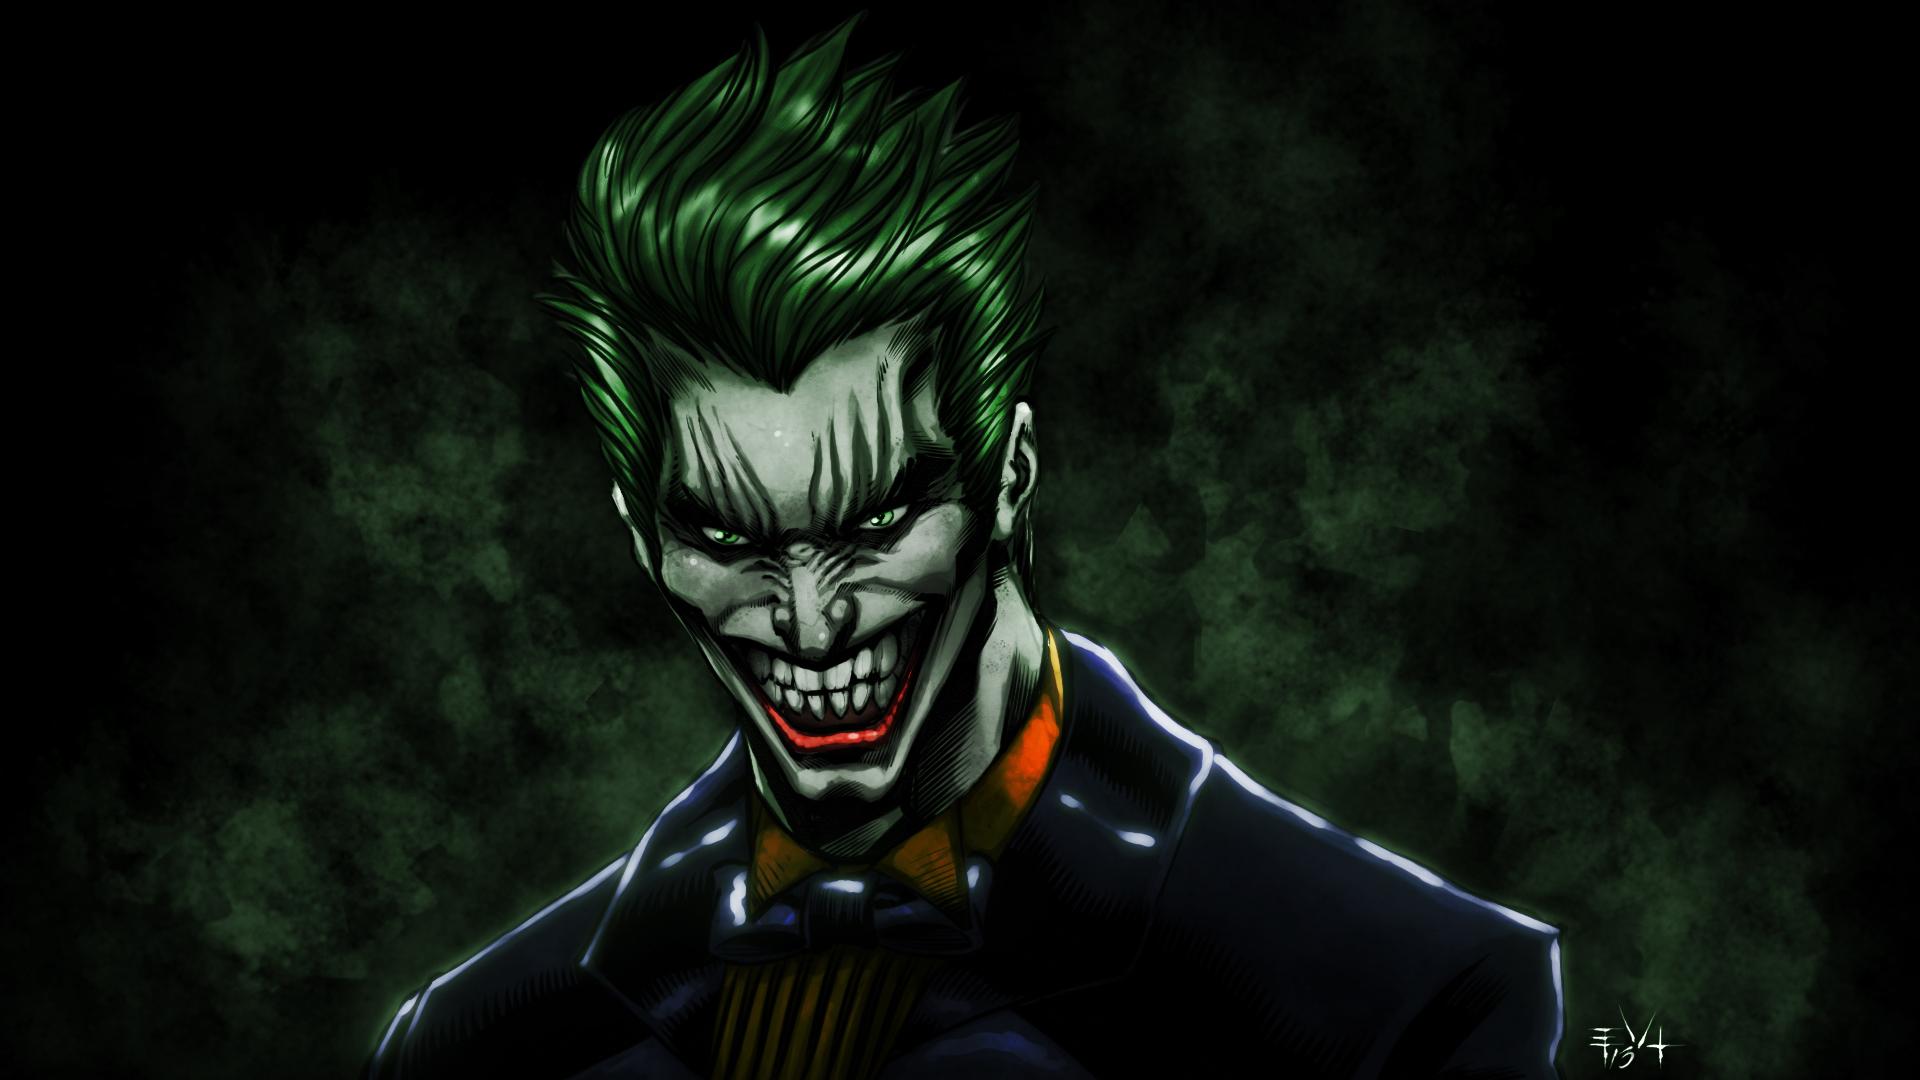 The Joker wallpaper and video by ErikVonLehmann 1920x1080